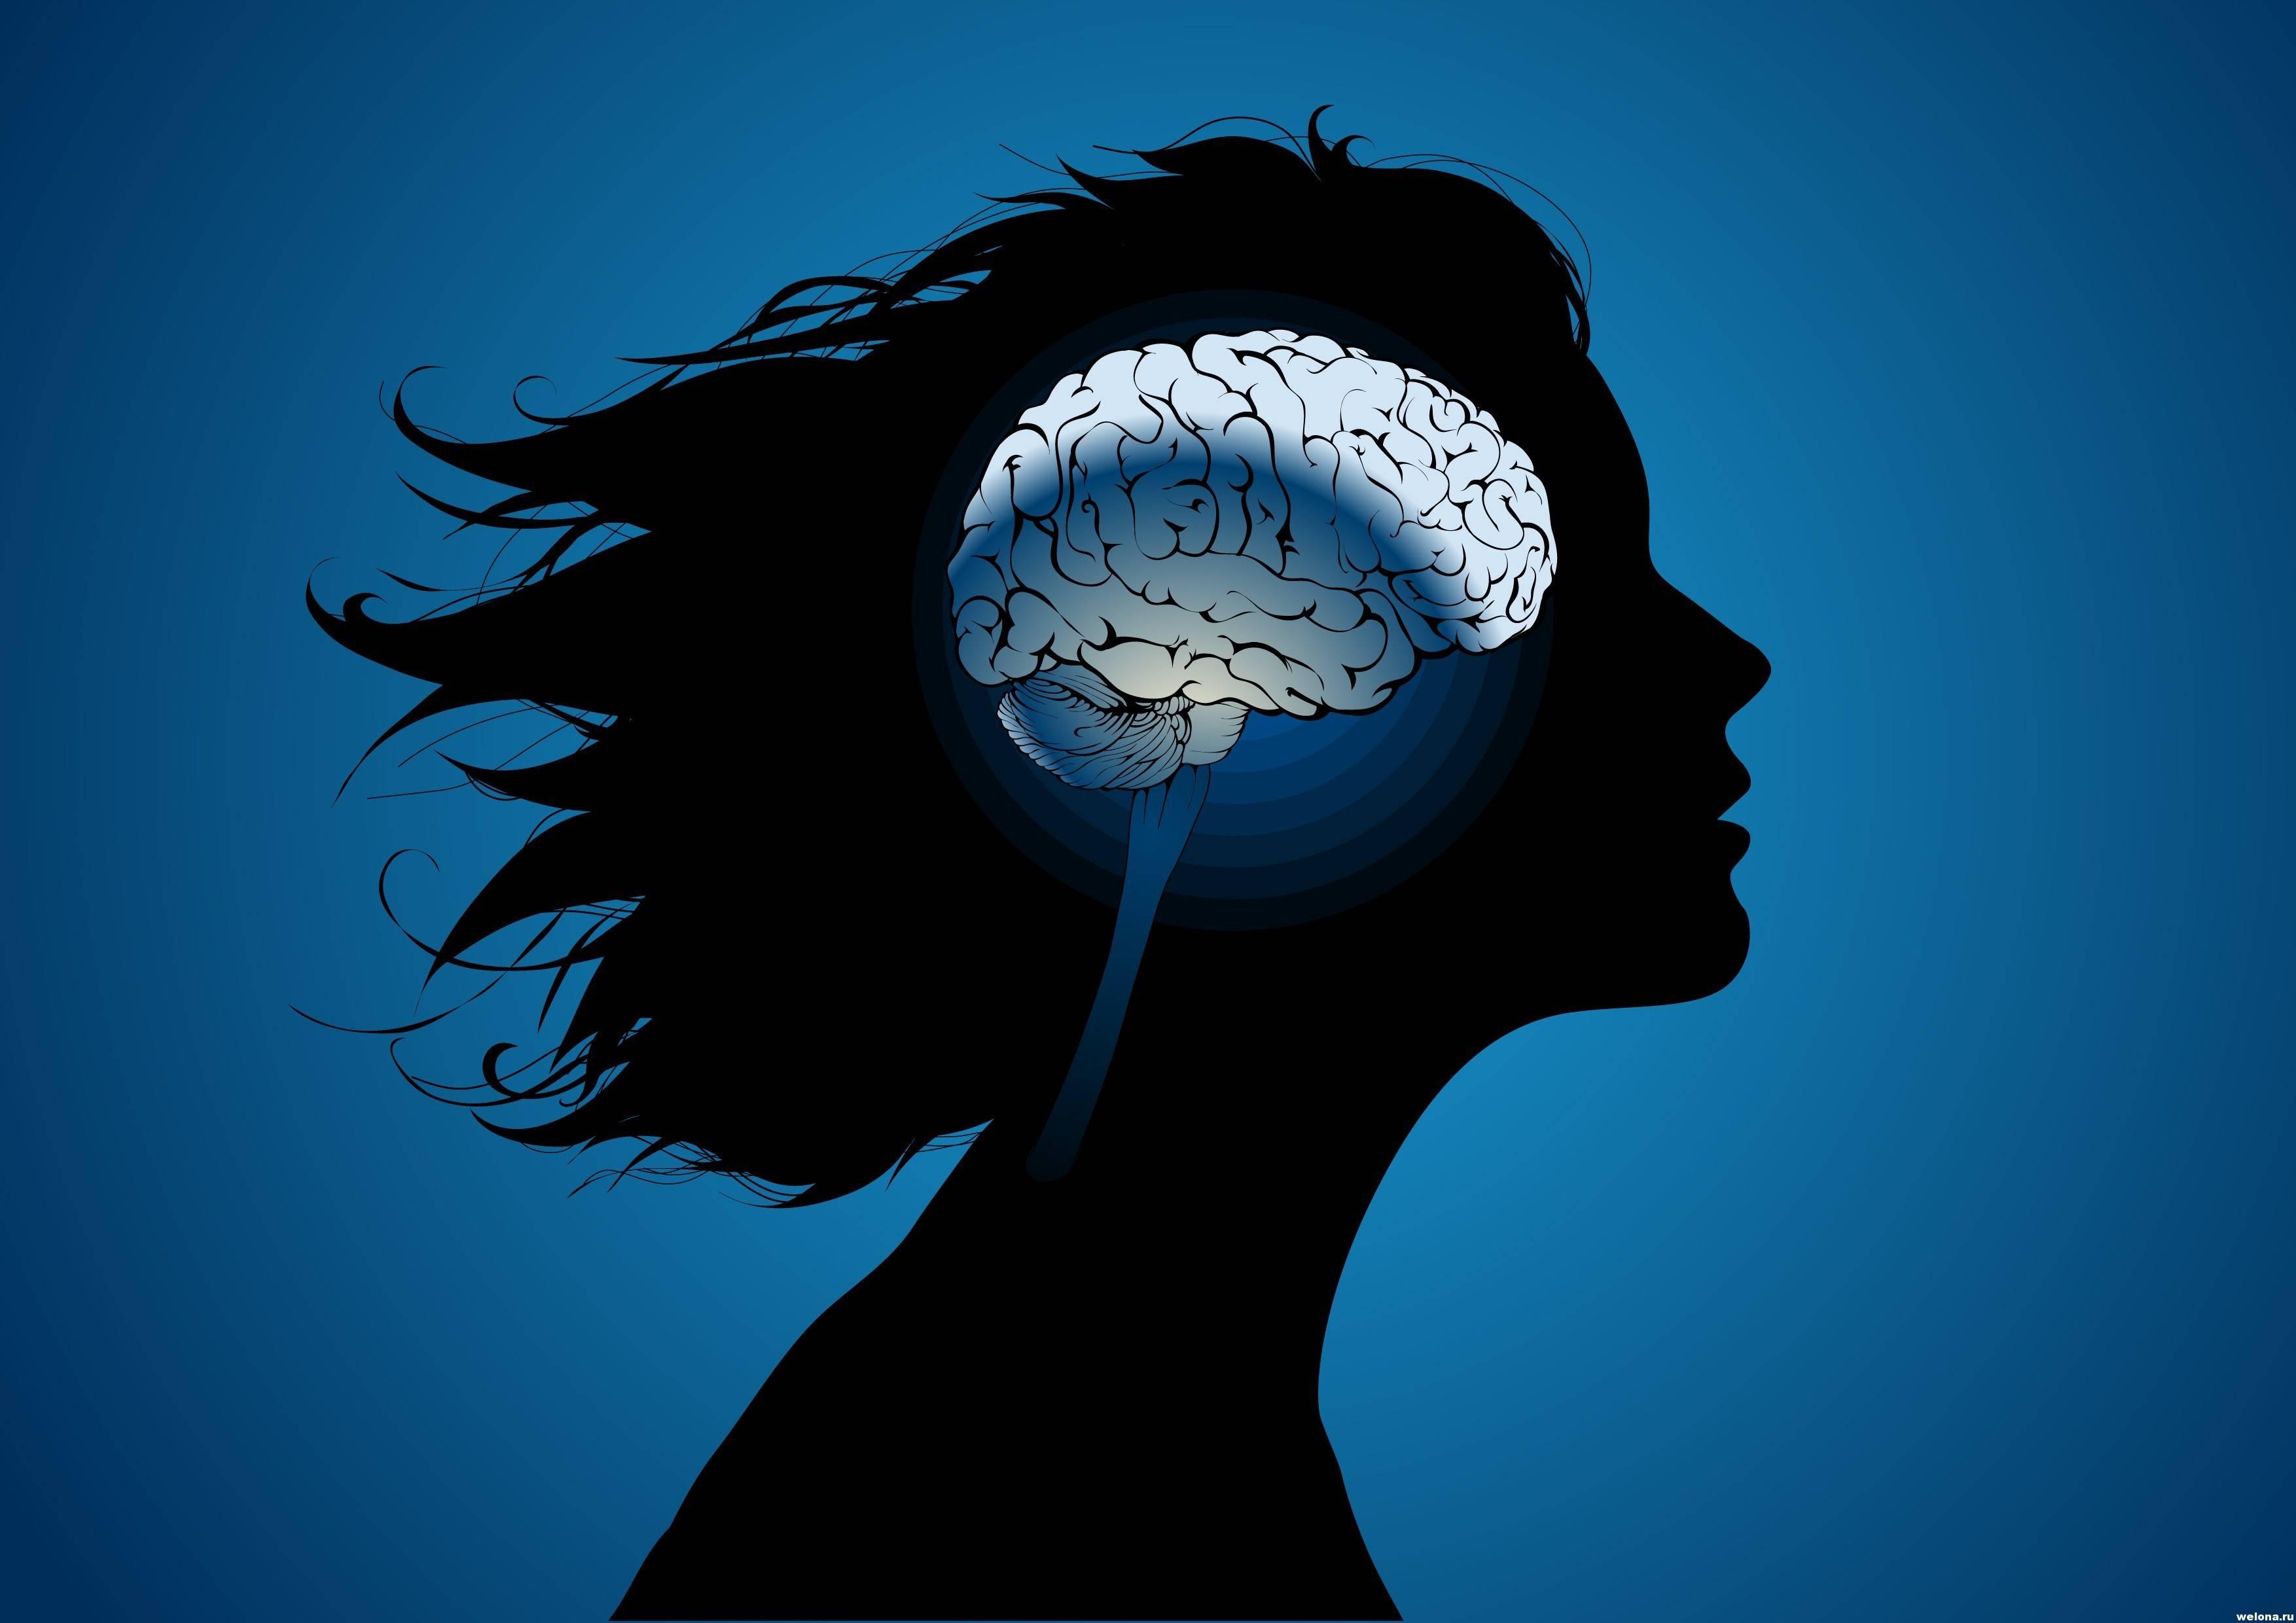 Повтори, согласись, добавь - сайт помощи психологам и студентам